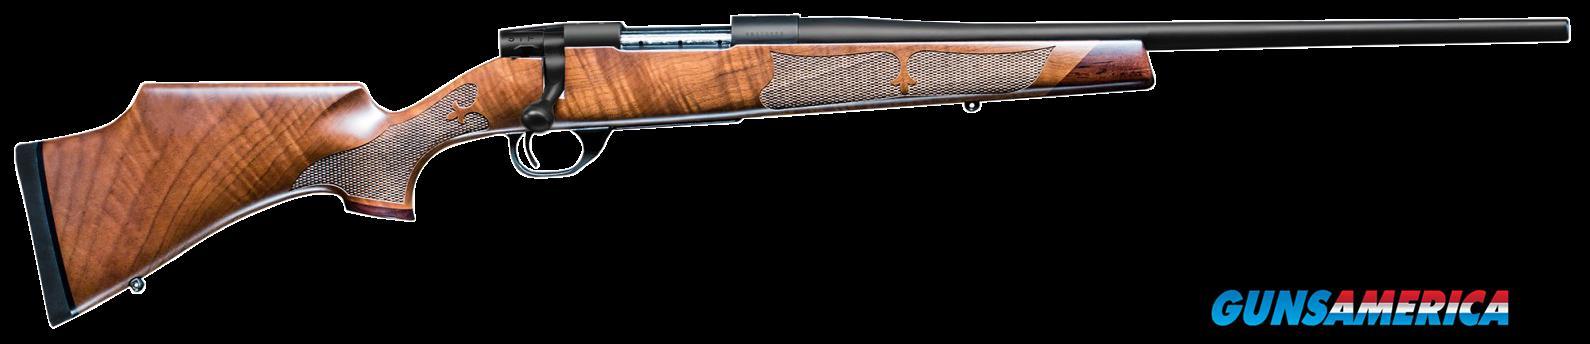 Weatherby Vanguard, Wthby Vwr308nroo Vgd Camilla 308  Guns > Pistols > 1911 Pistol Copies (non-Colt)